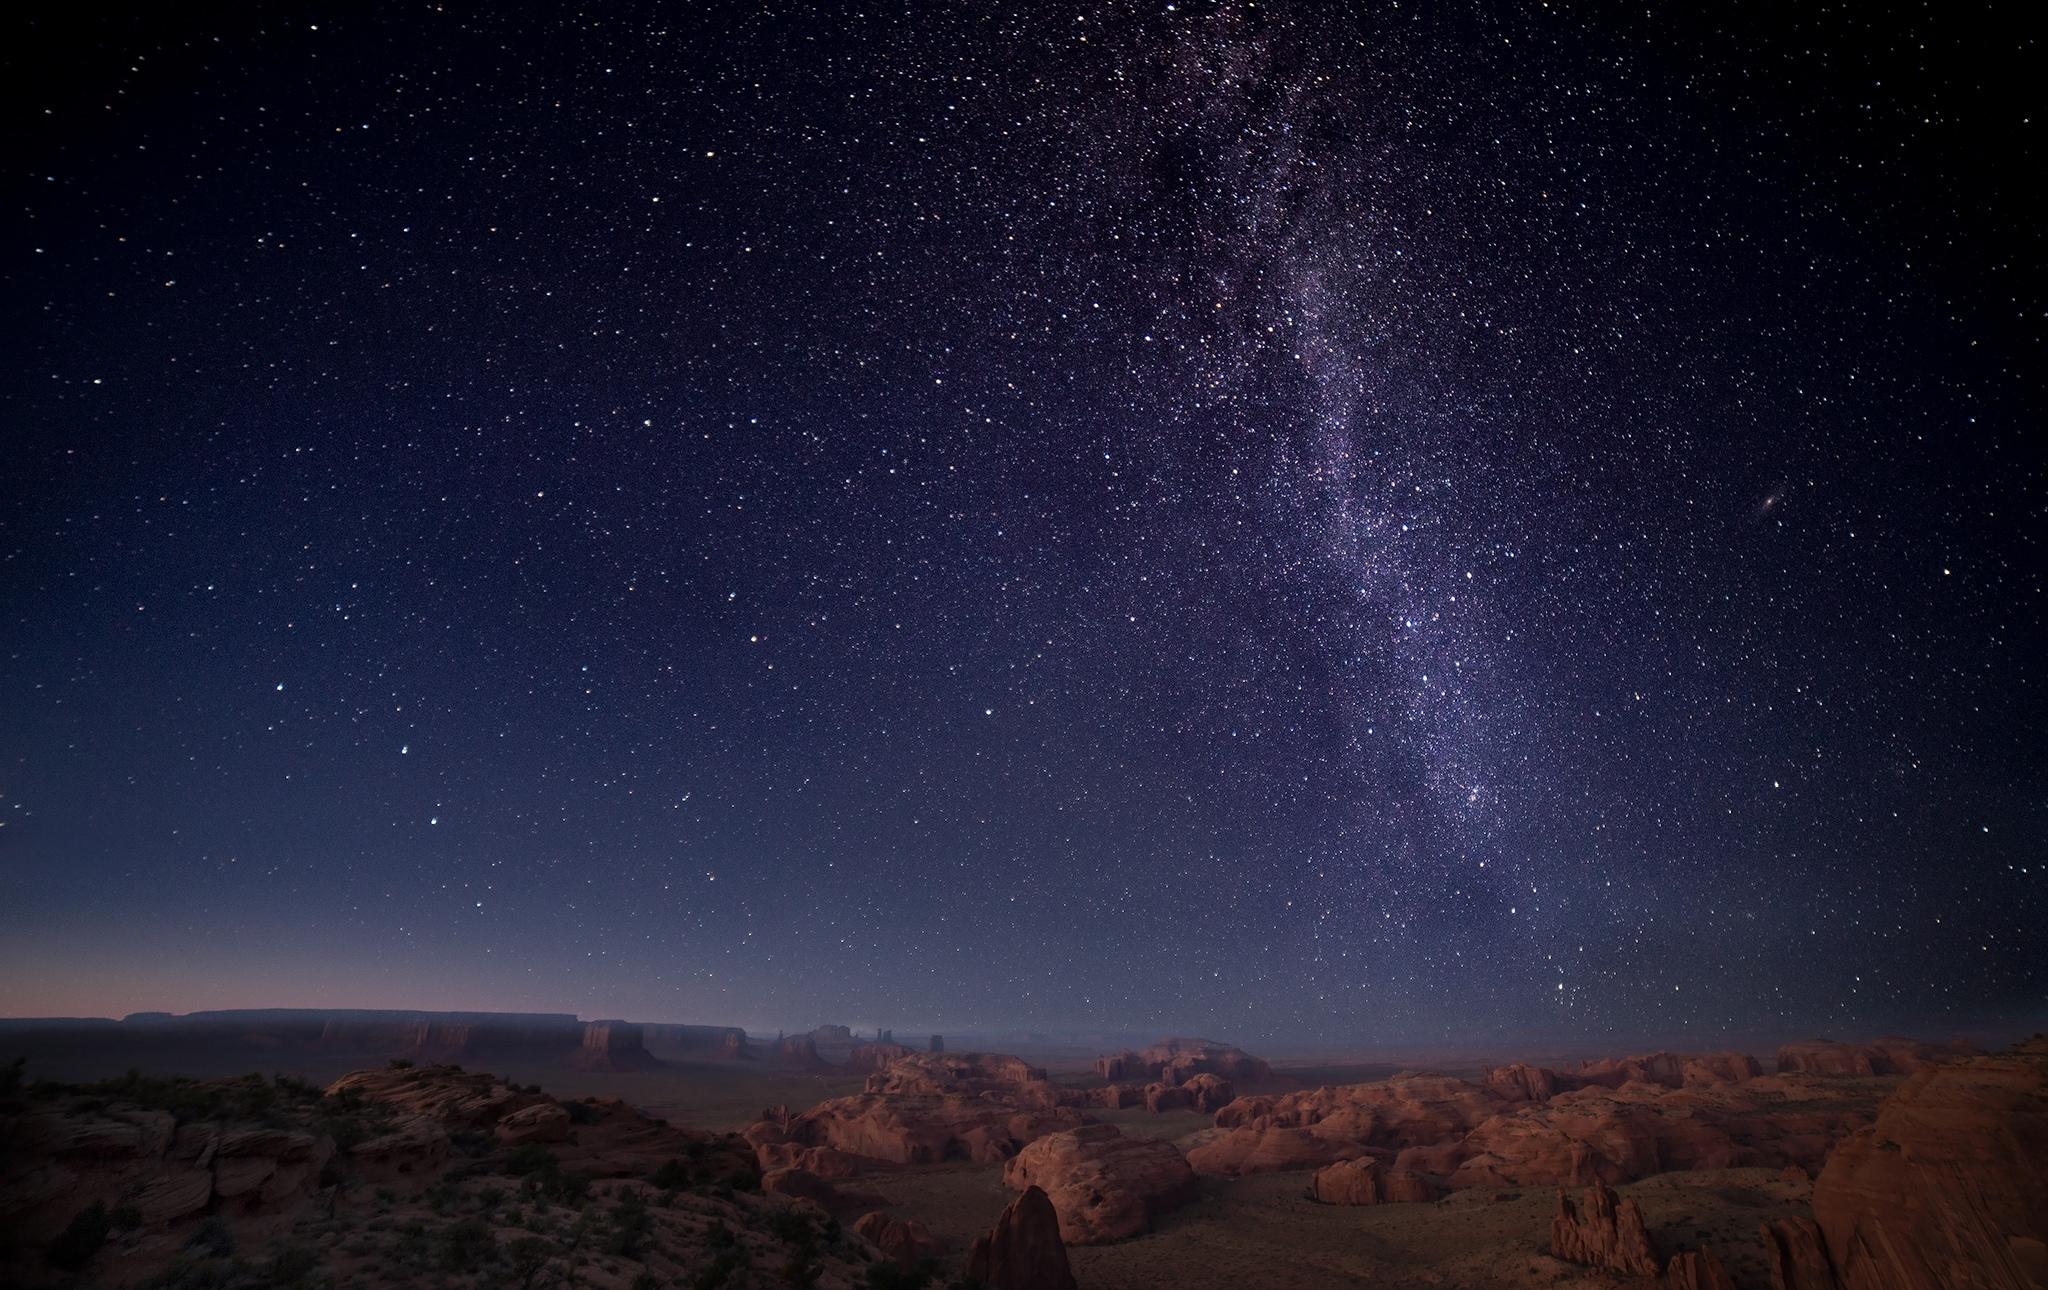 фото ночного неба в сахаре схеме комплекс